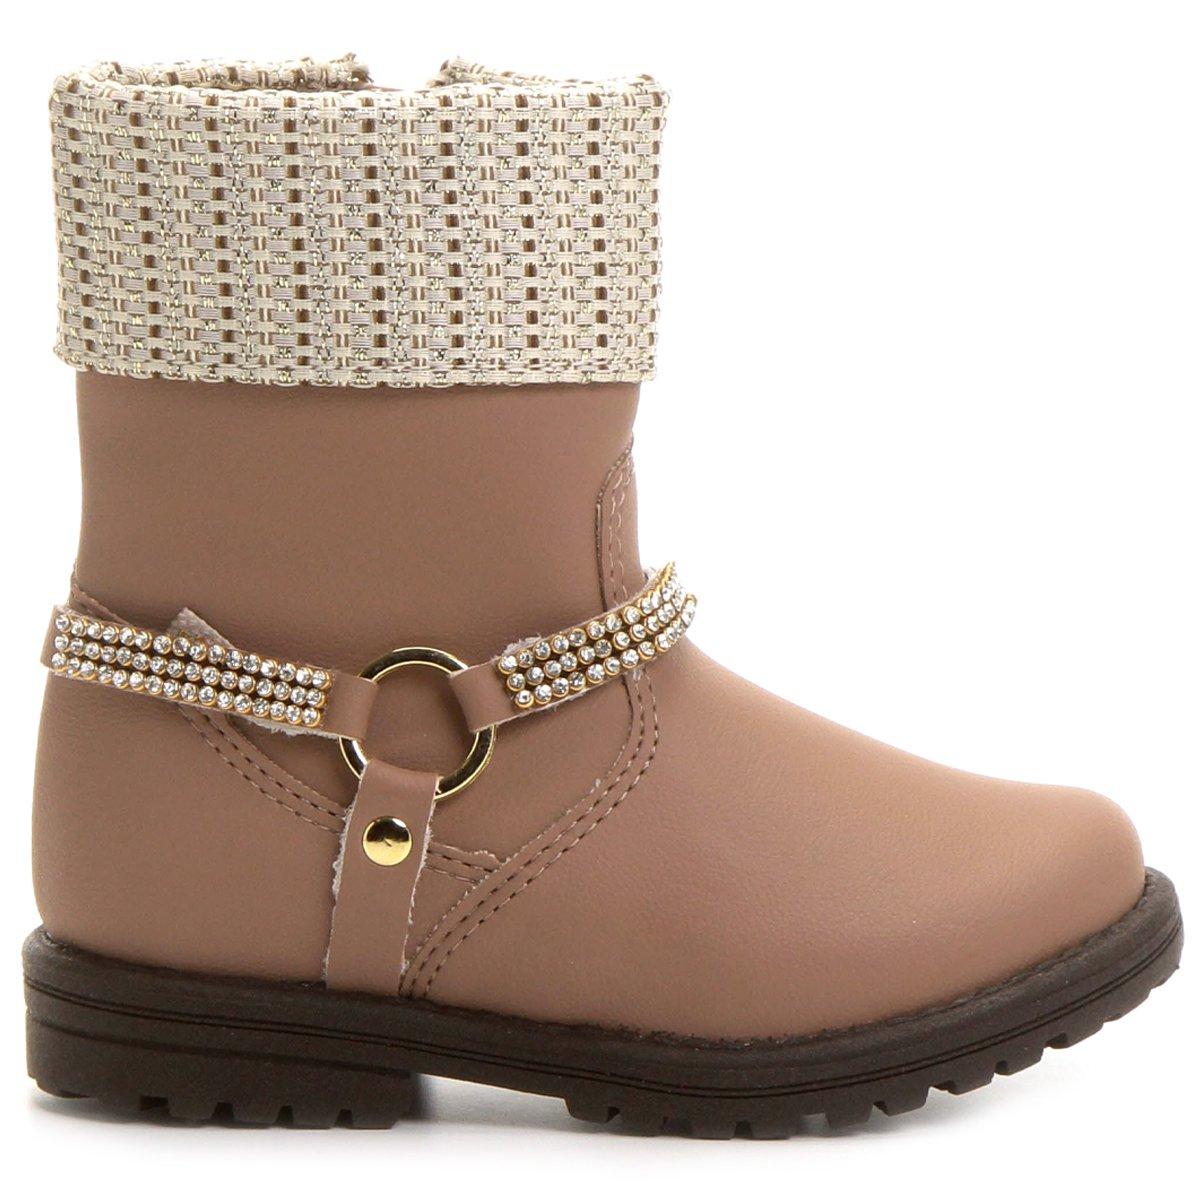 4e16489f98 Bota Kidy Coturno Fashion Baby - Compre Agora